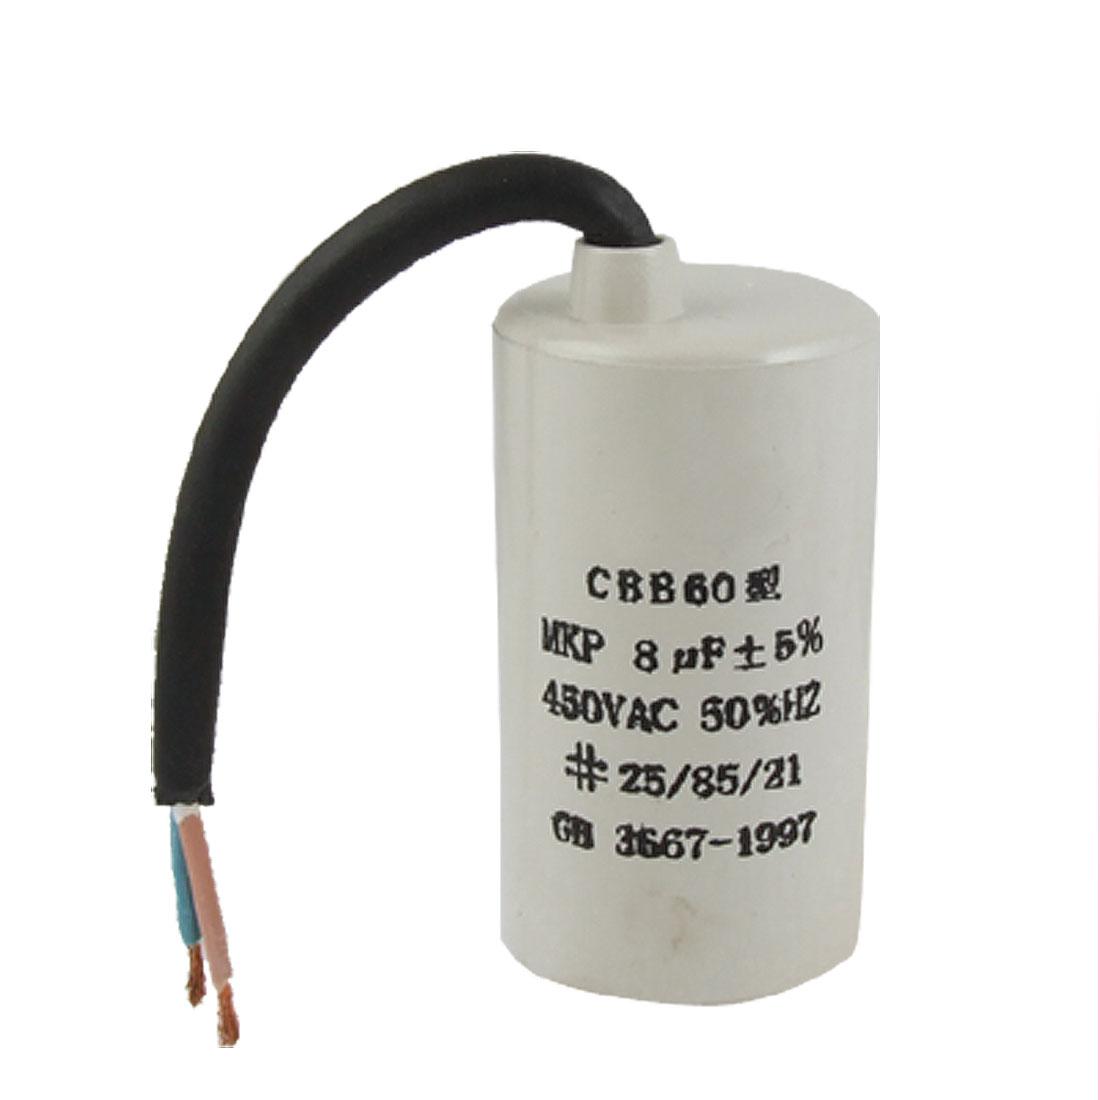 CBB60 Round Motor Run Capacitor 8uF MFD 450VAC 50HZ